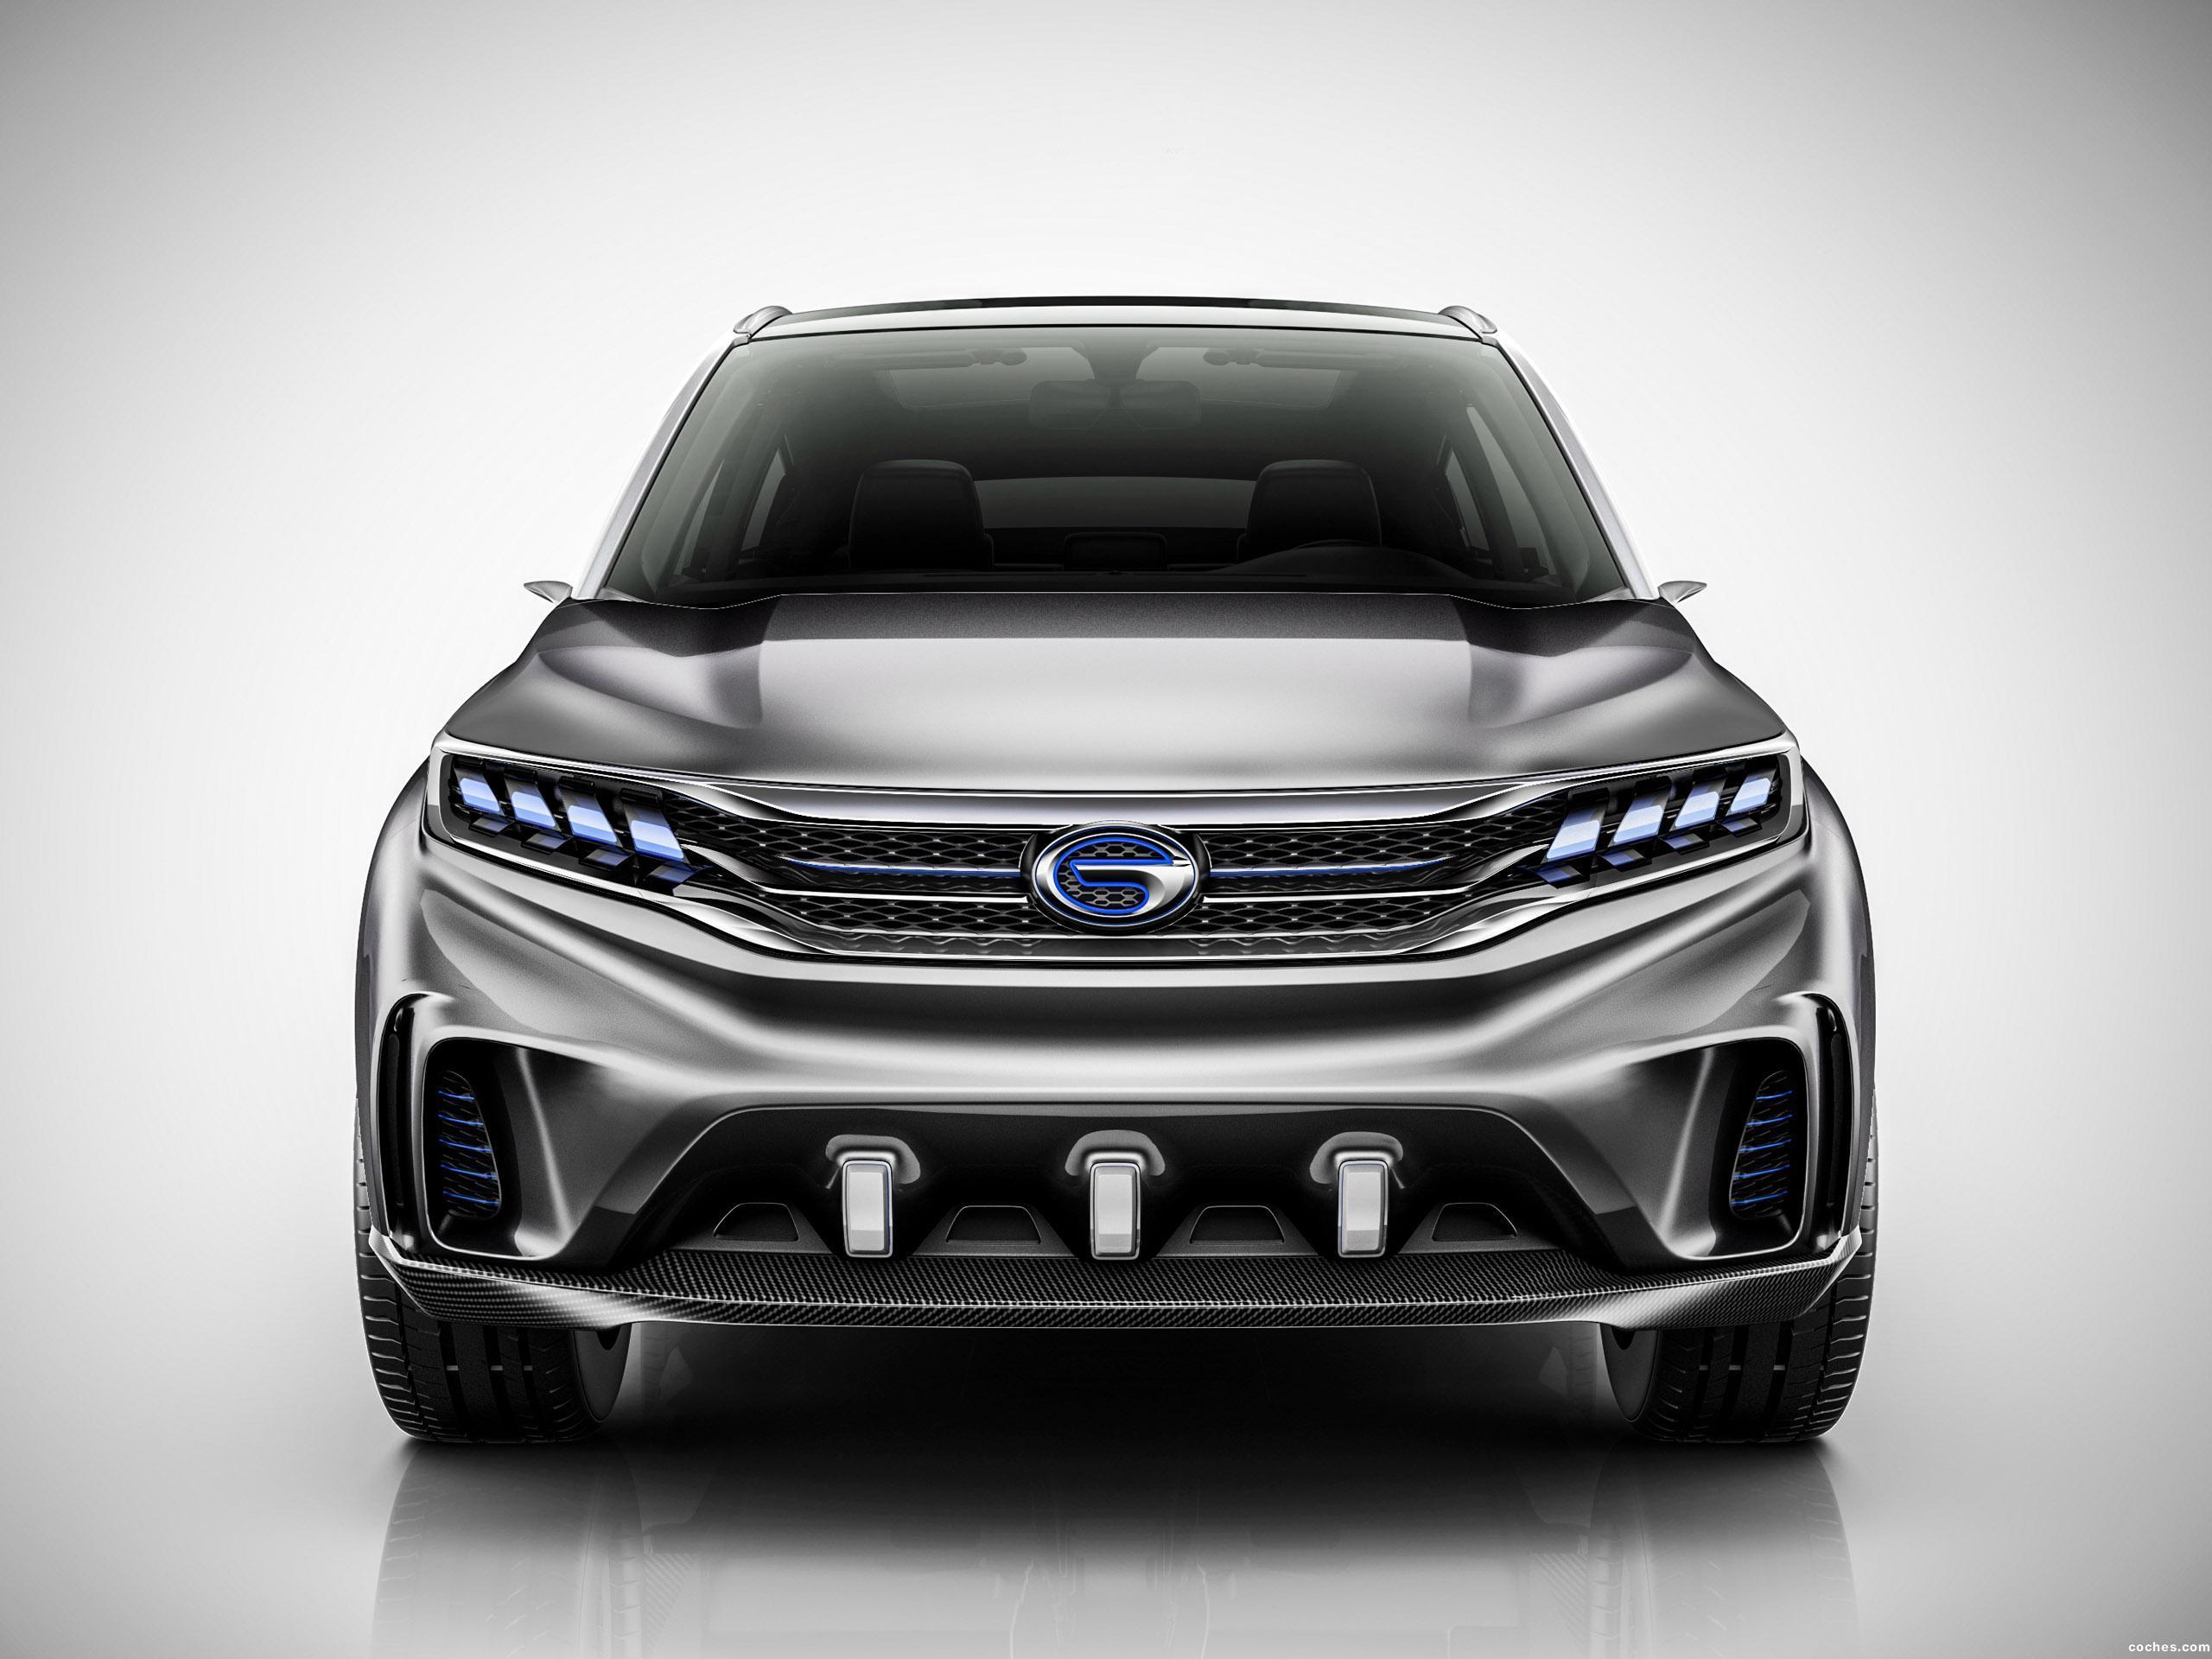 Foto 0 de Trumpchi  Ev Coupe Concept 2017